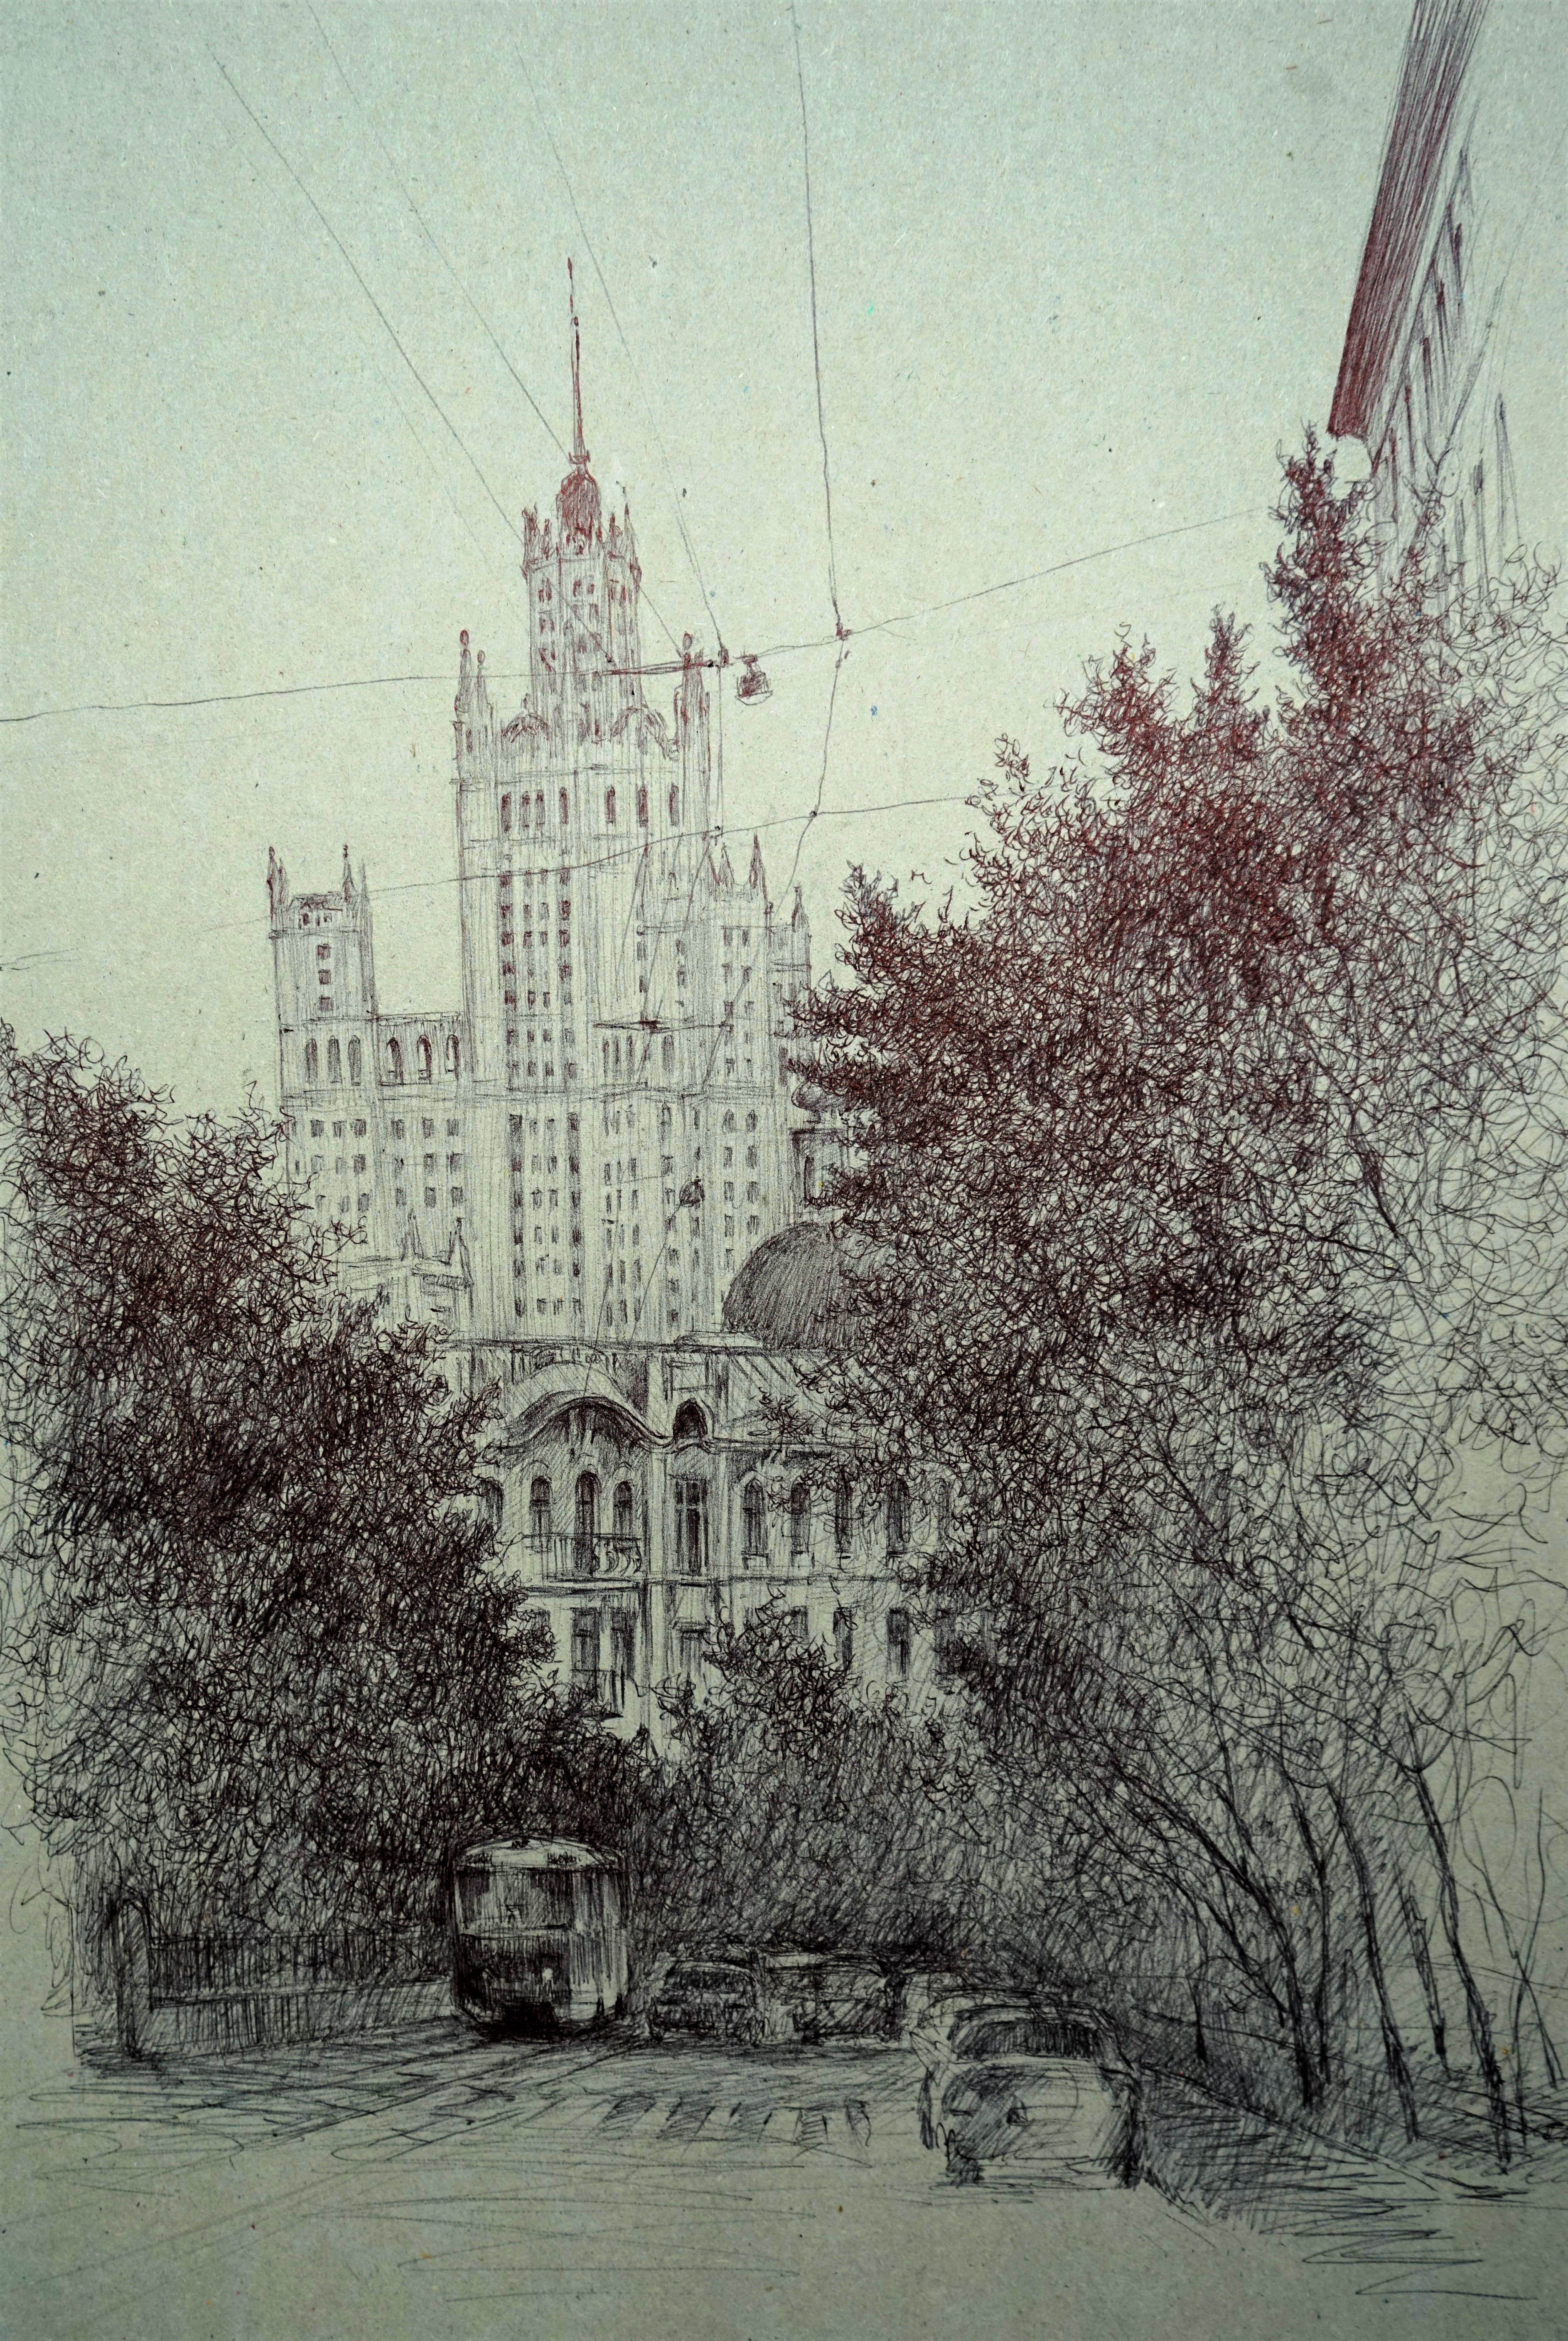 Панюкова Нина Майская суббота Яузский бульвар 37х25 картон ручка тушь